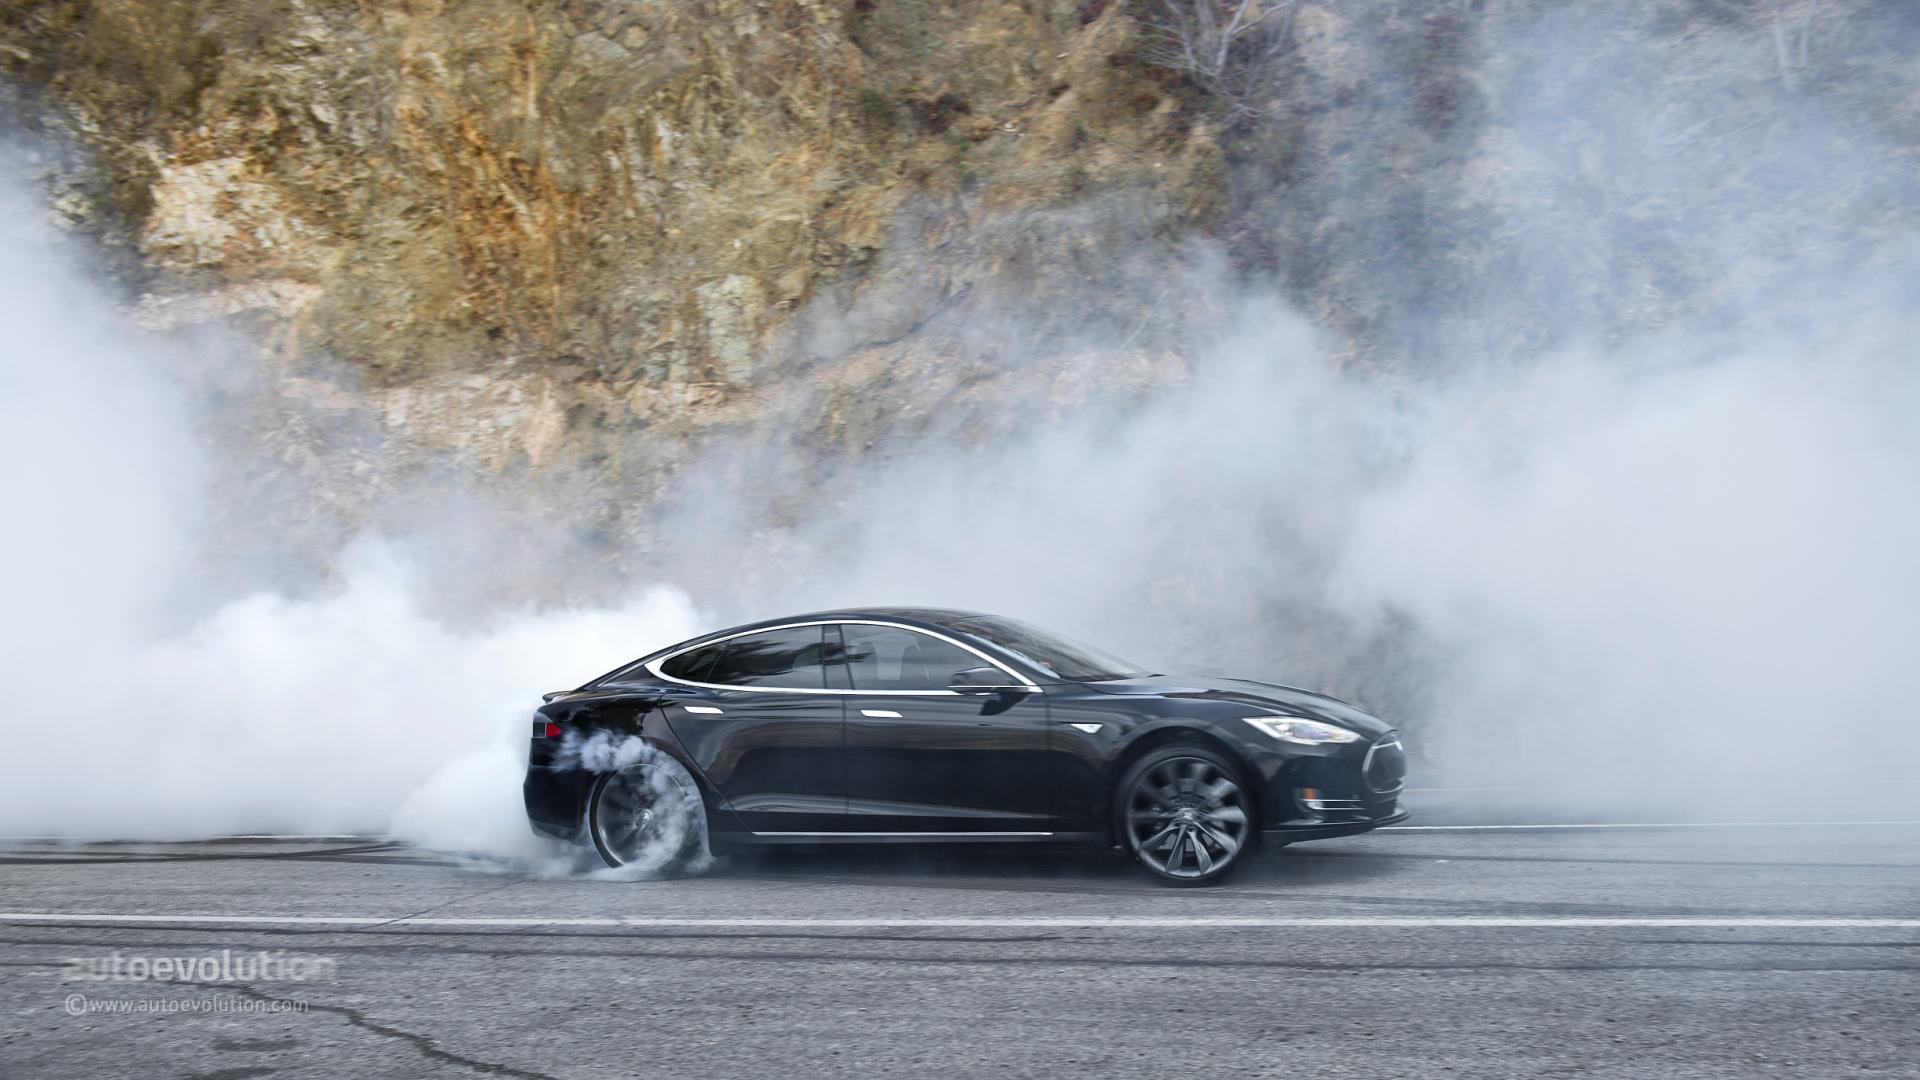 tesla model s doing monster burnouts: hd wallpapers - autoevolution